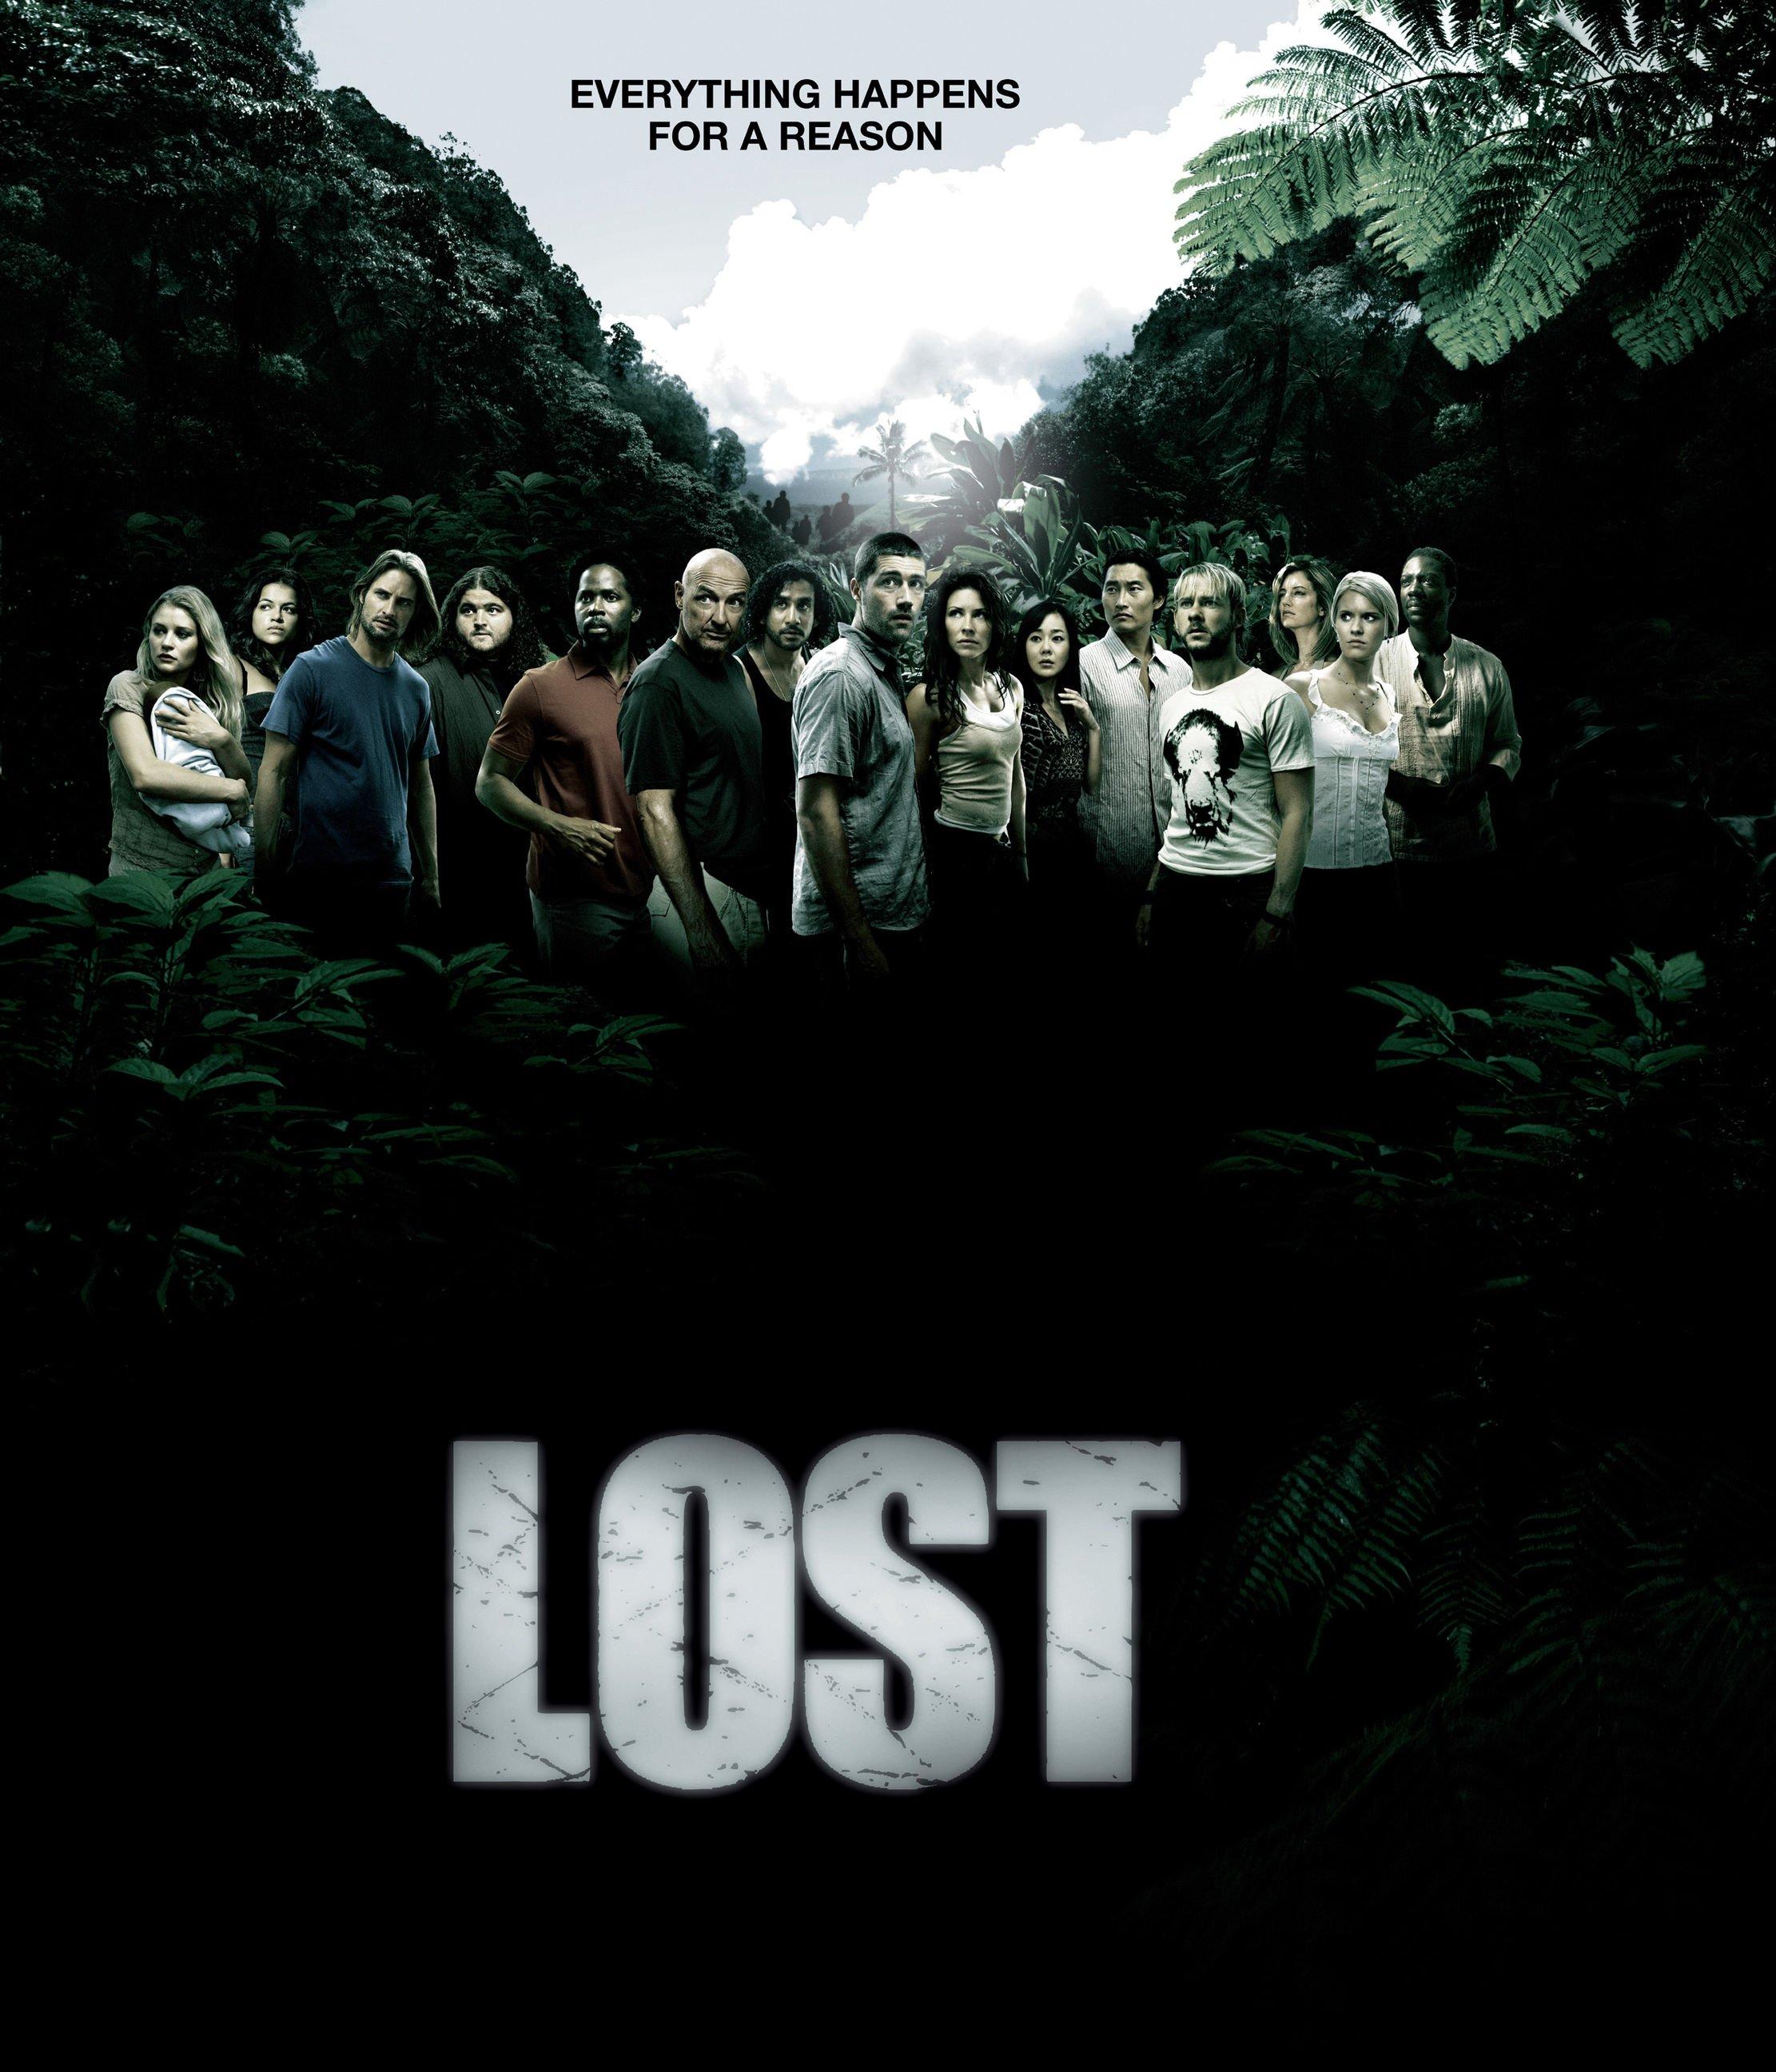 lost 4 сезон 11 серия